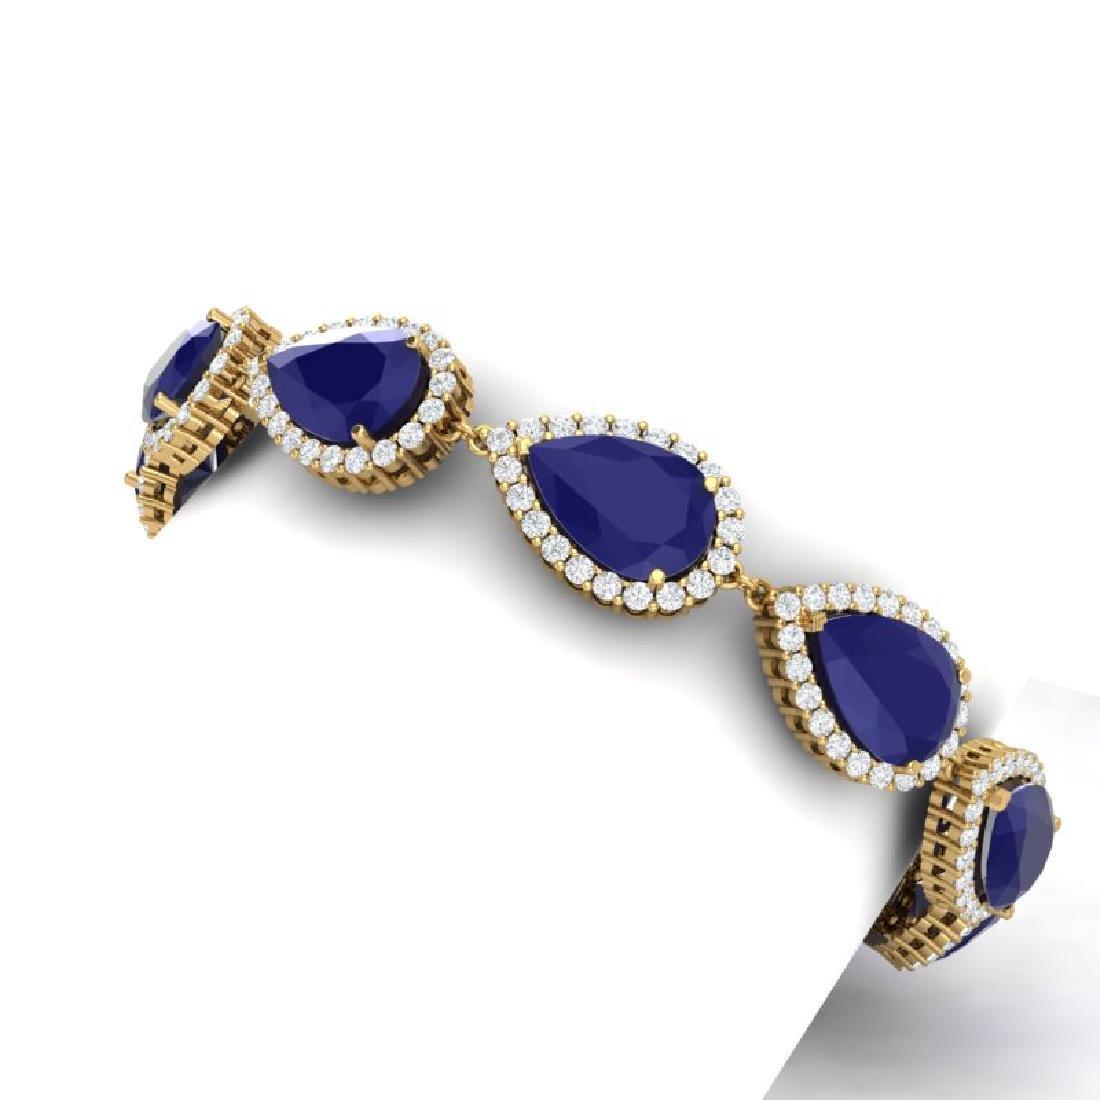 42 CTW Royalty Sapphire & VS Diamond Bracelet 18K - 2